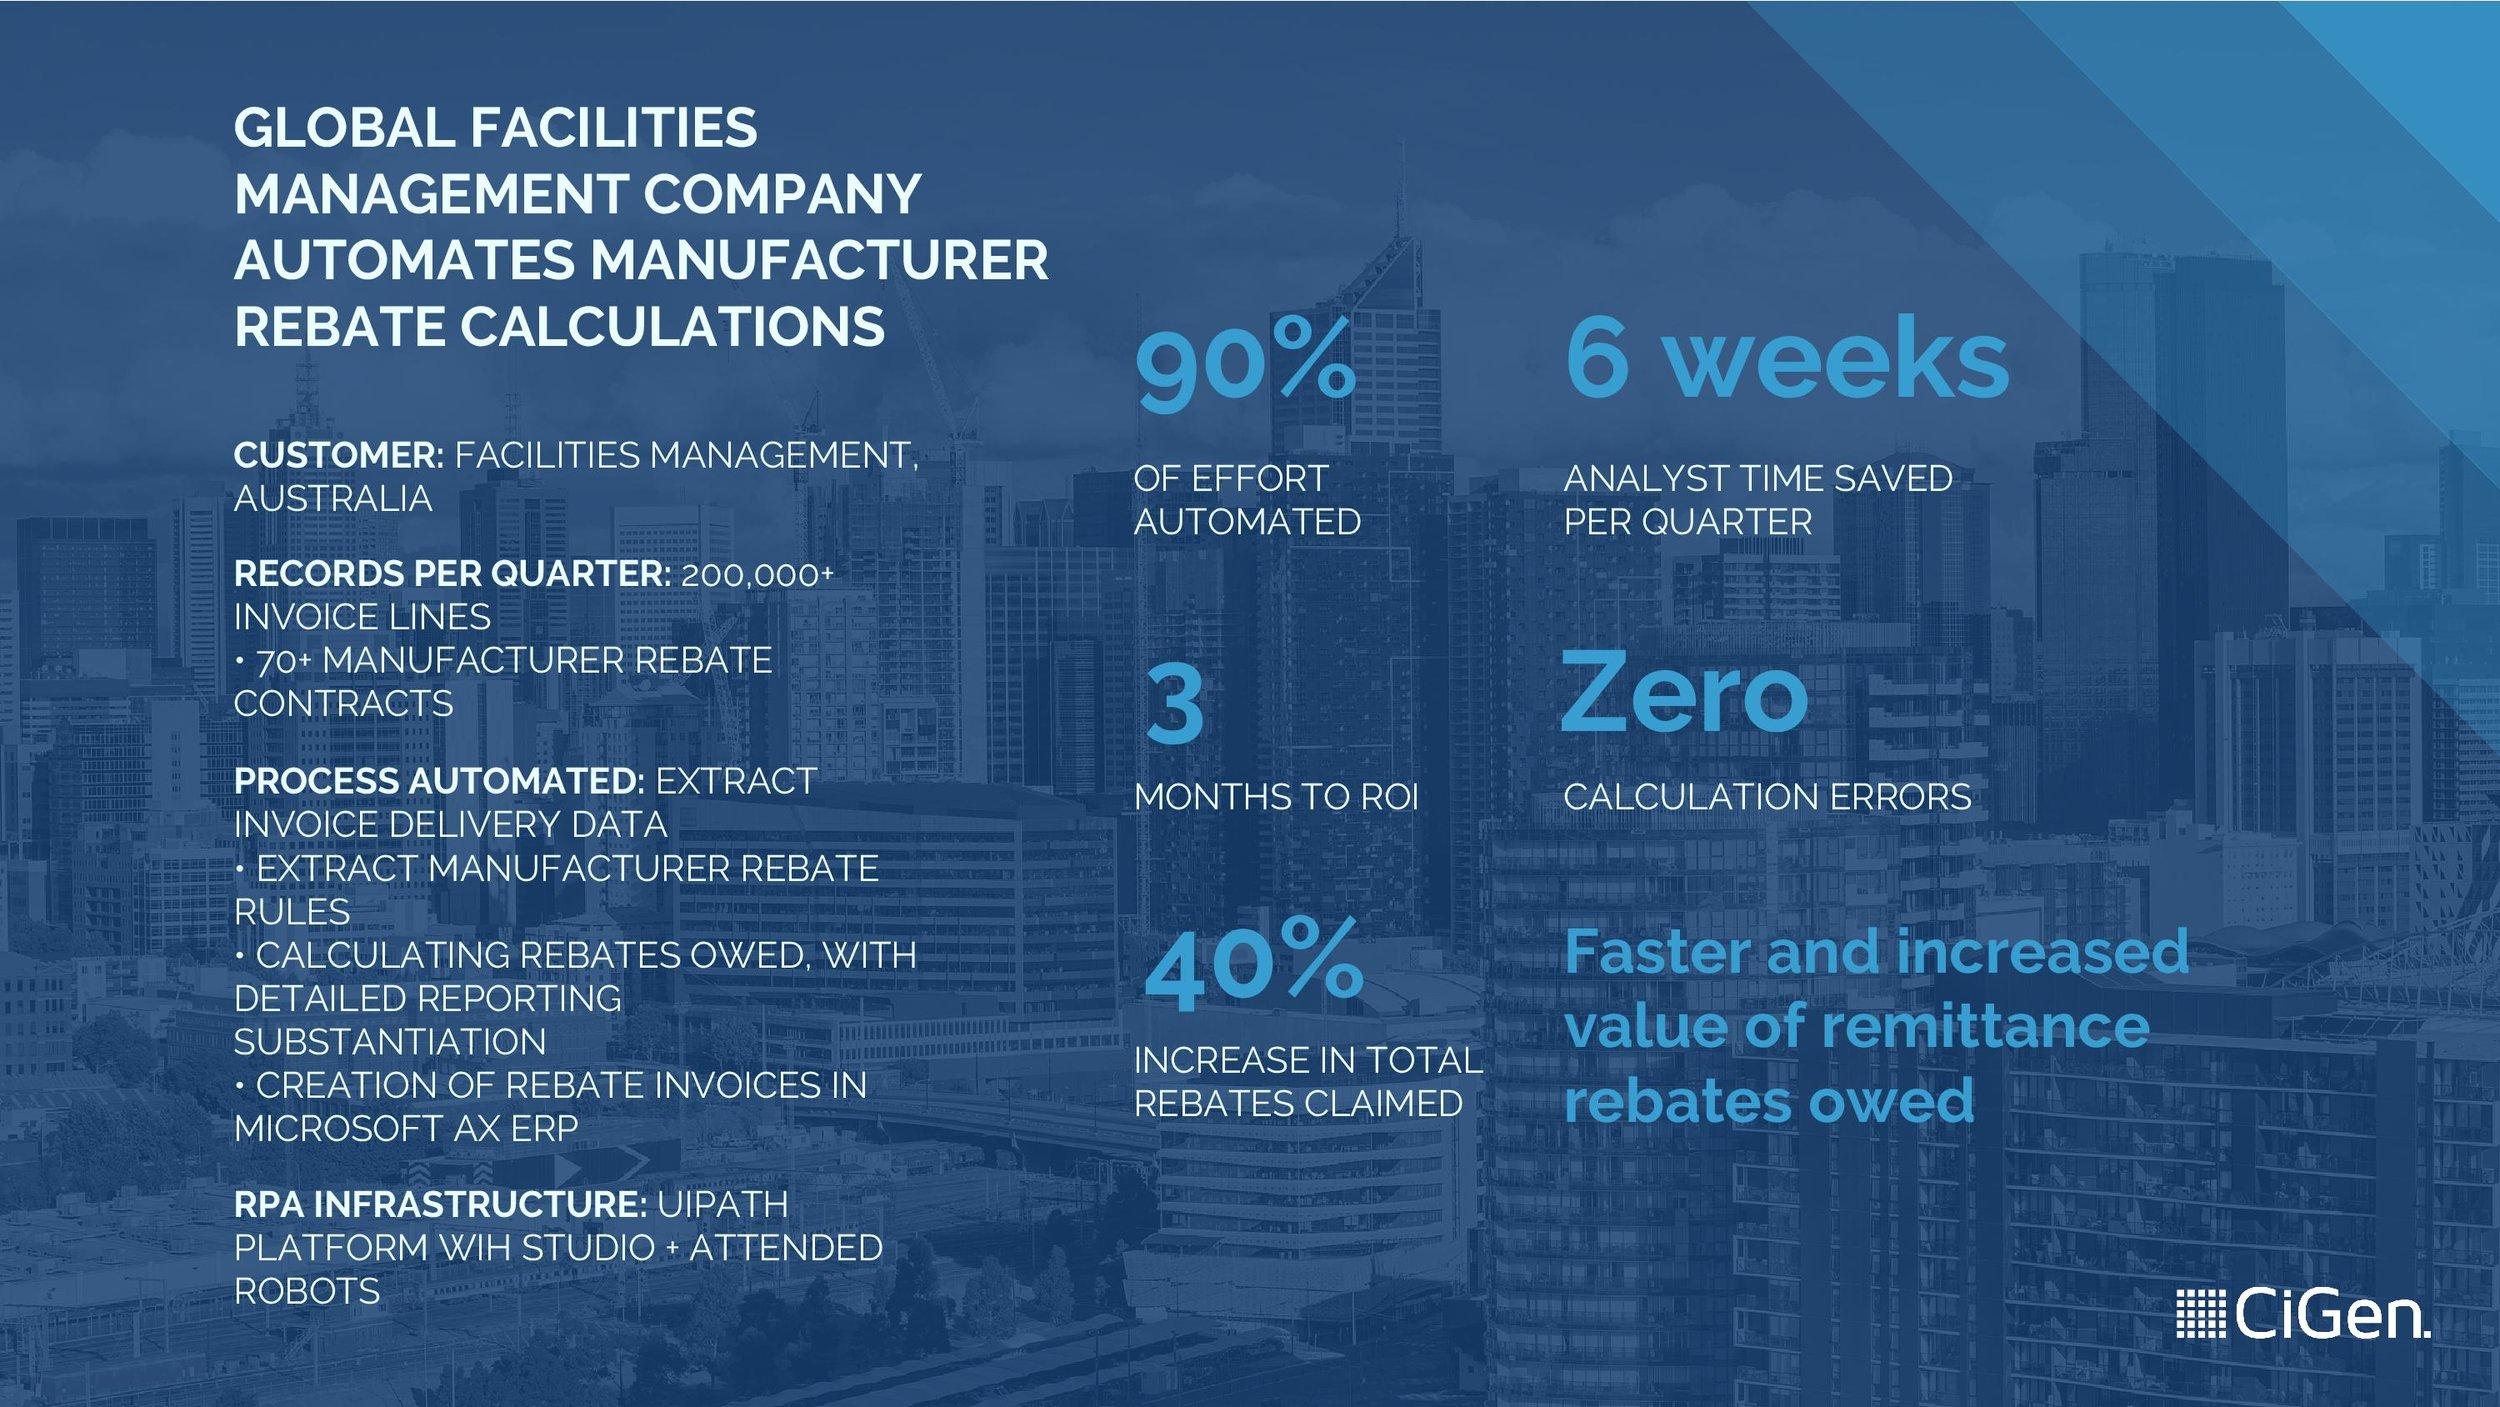 CiGen-robotic-process-automation-RPA-Australia-case-study-global-facilities-management-company-automates-manufacturer-rebate-calculations-page-002.jpg